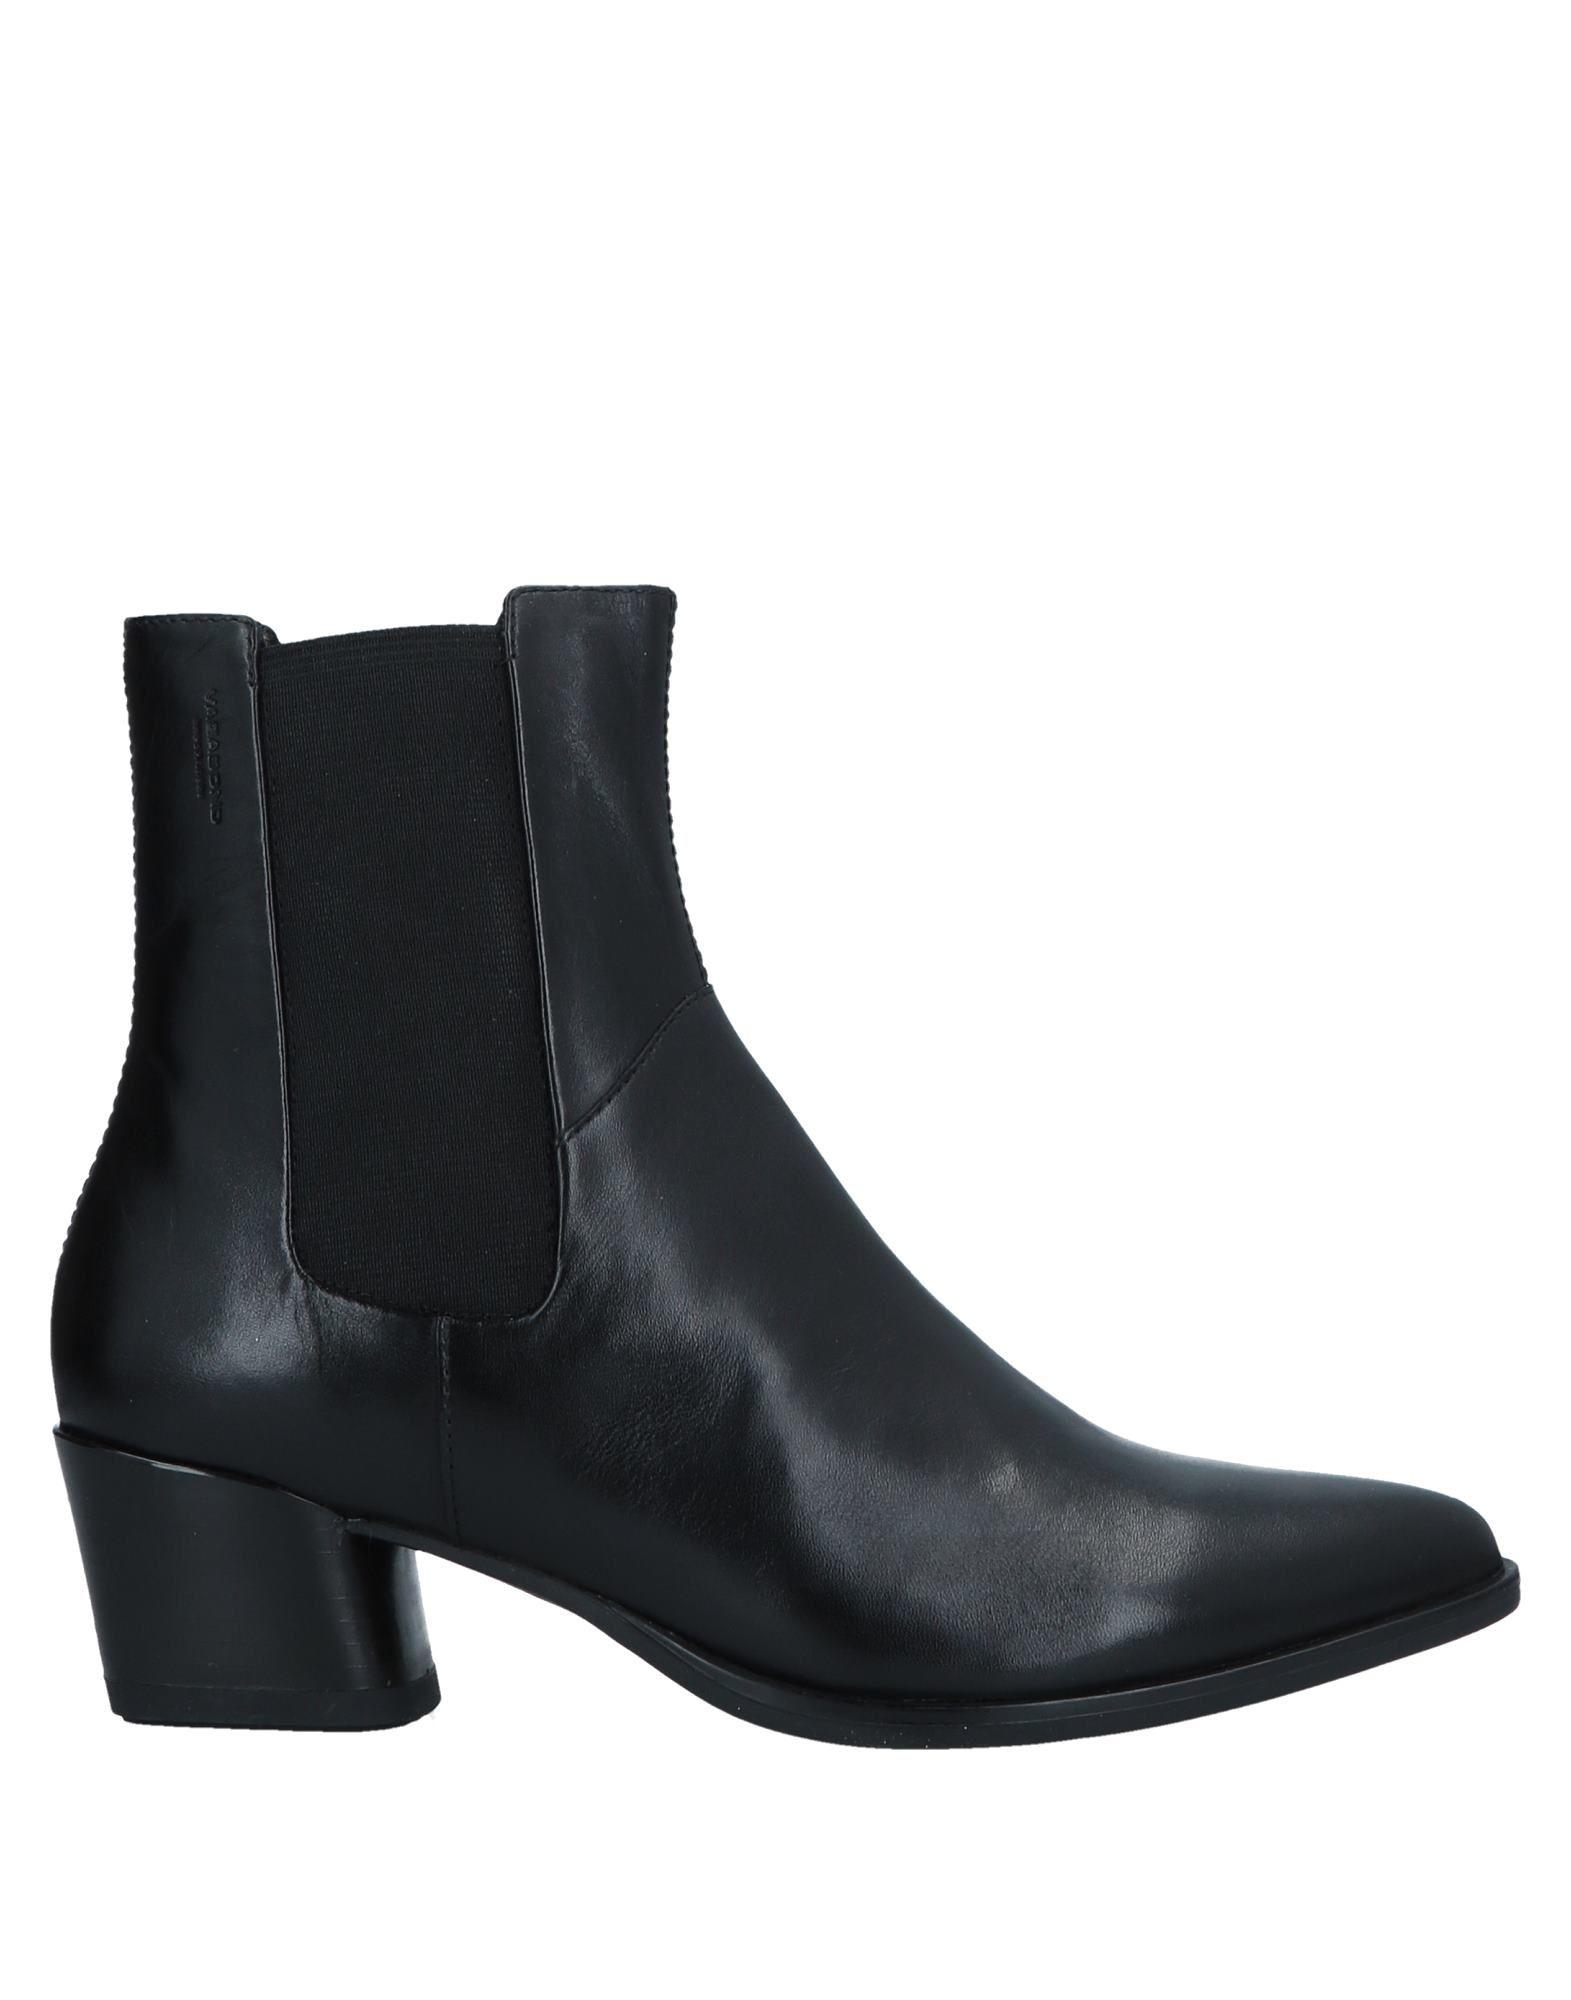 VAGABOND SHOEMAKERS Полусапоги и высокие ботинки ботинки vagabond 4282 040 64